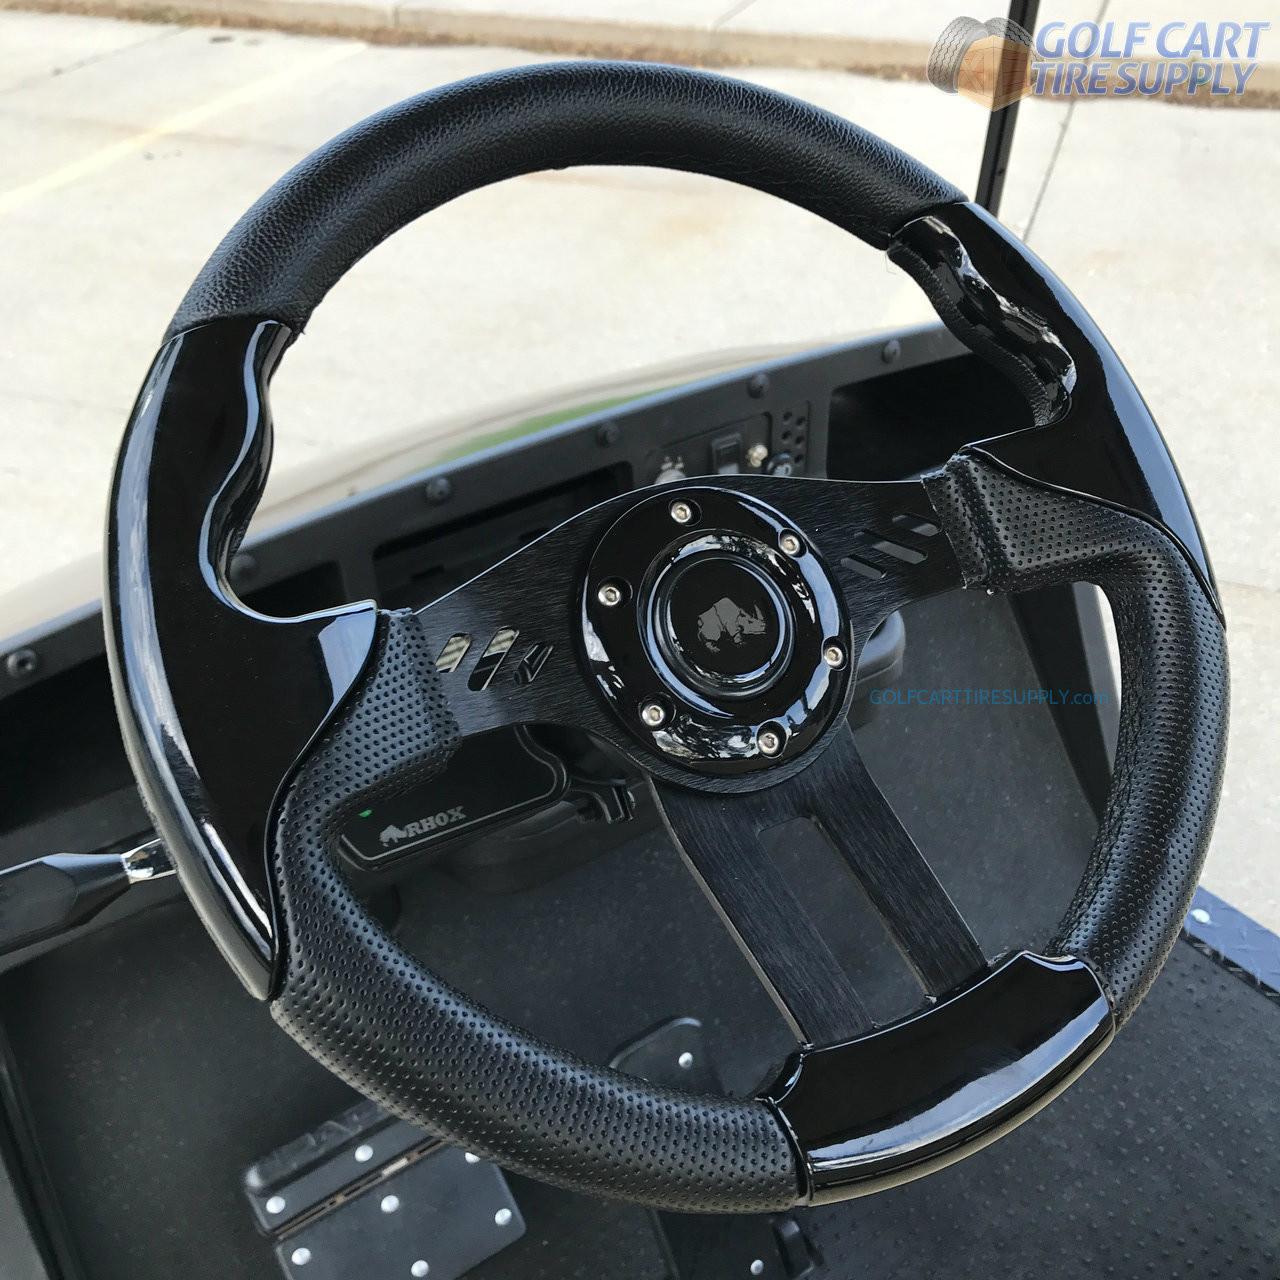 medium resolution of 13 aviator 5 black ez go golf cart steering wheel w black aluminum spokes golf cart tire supply